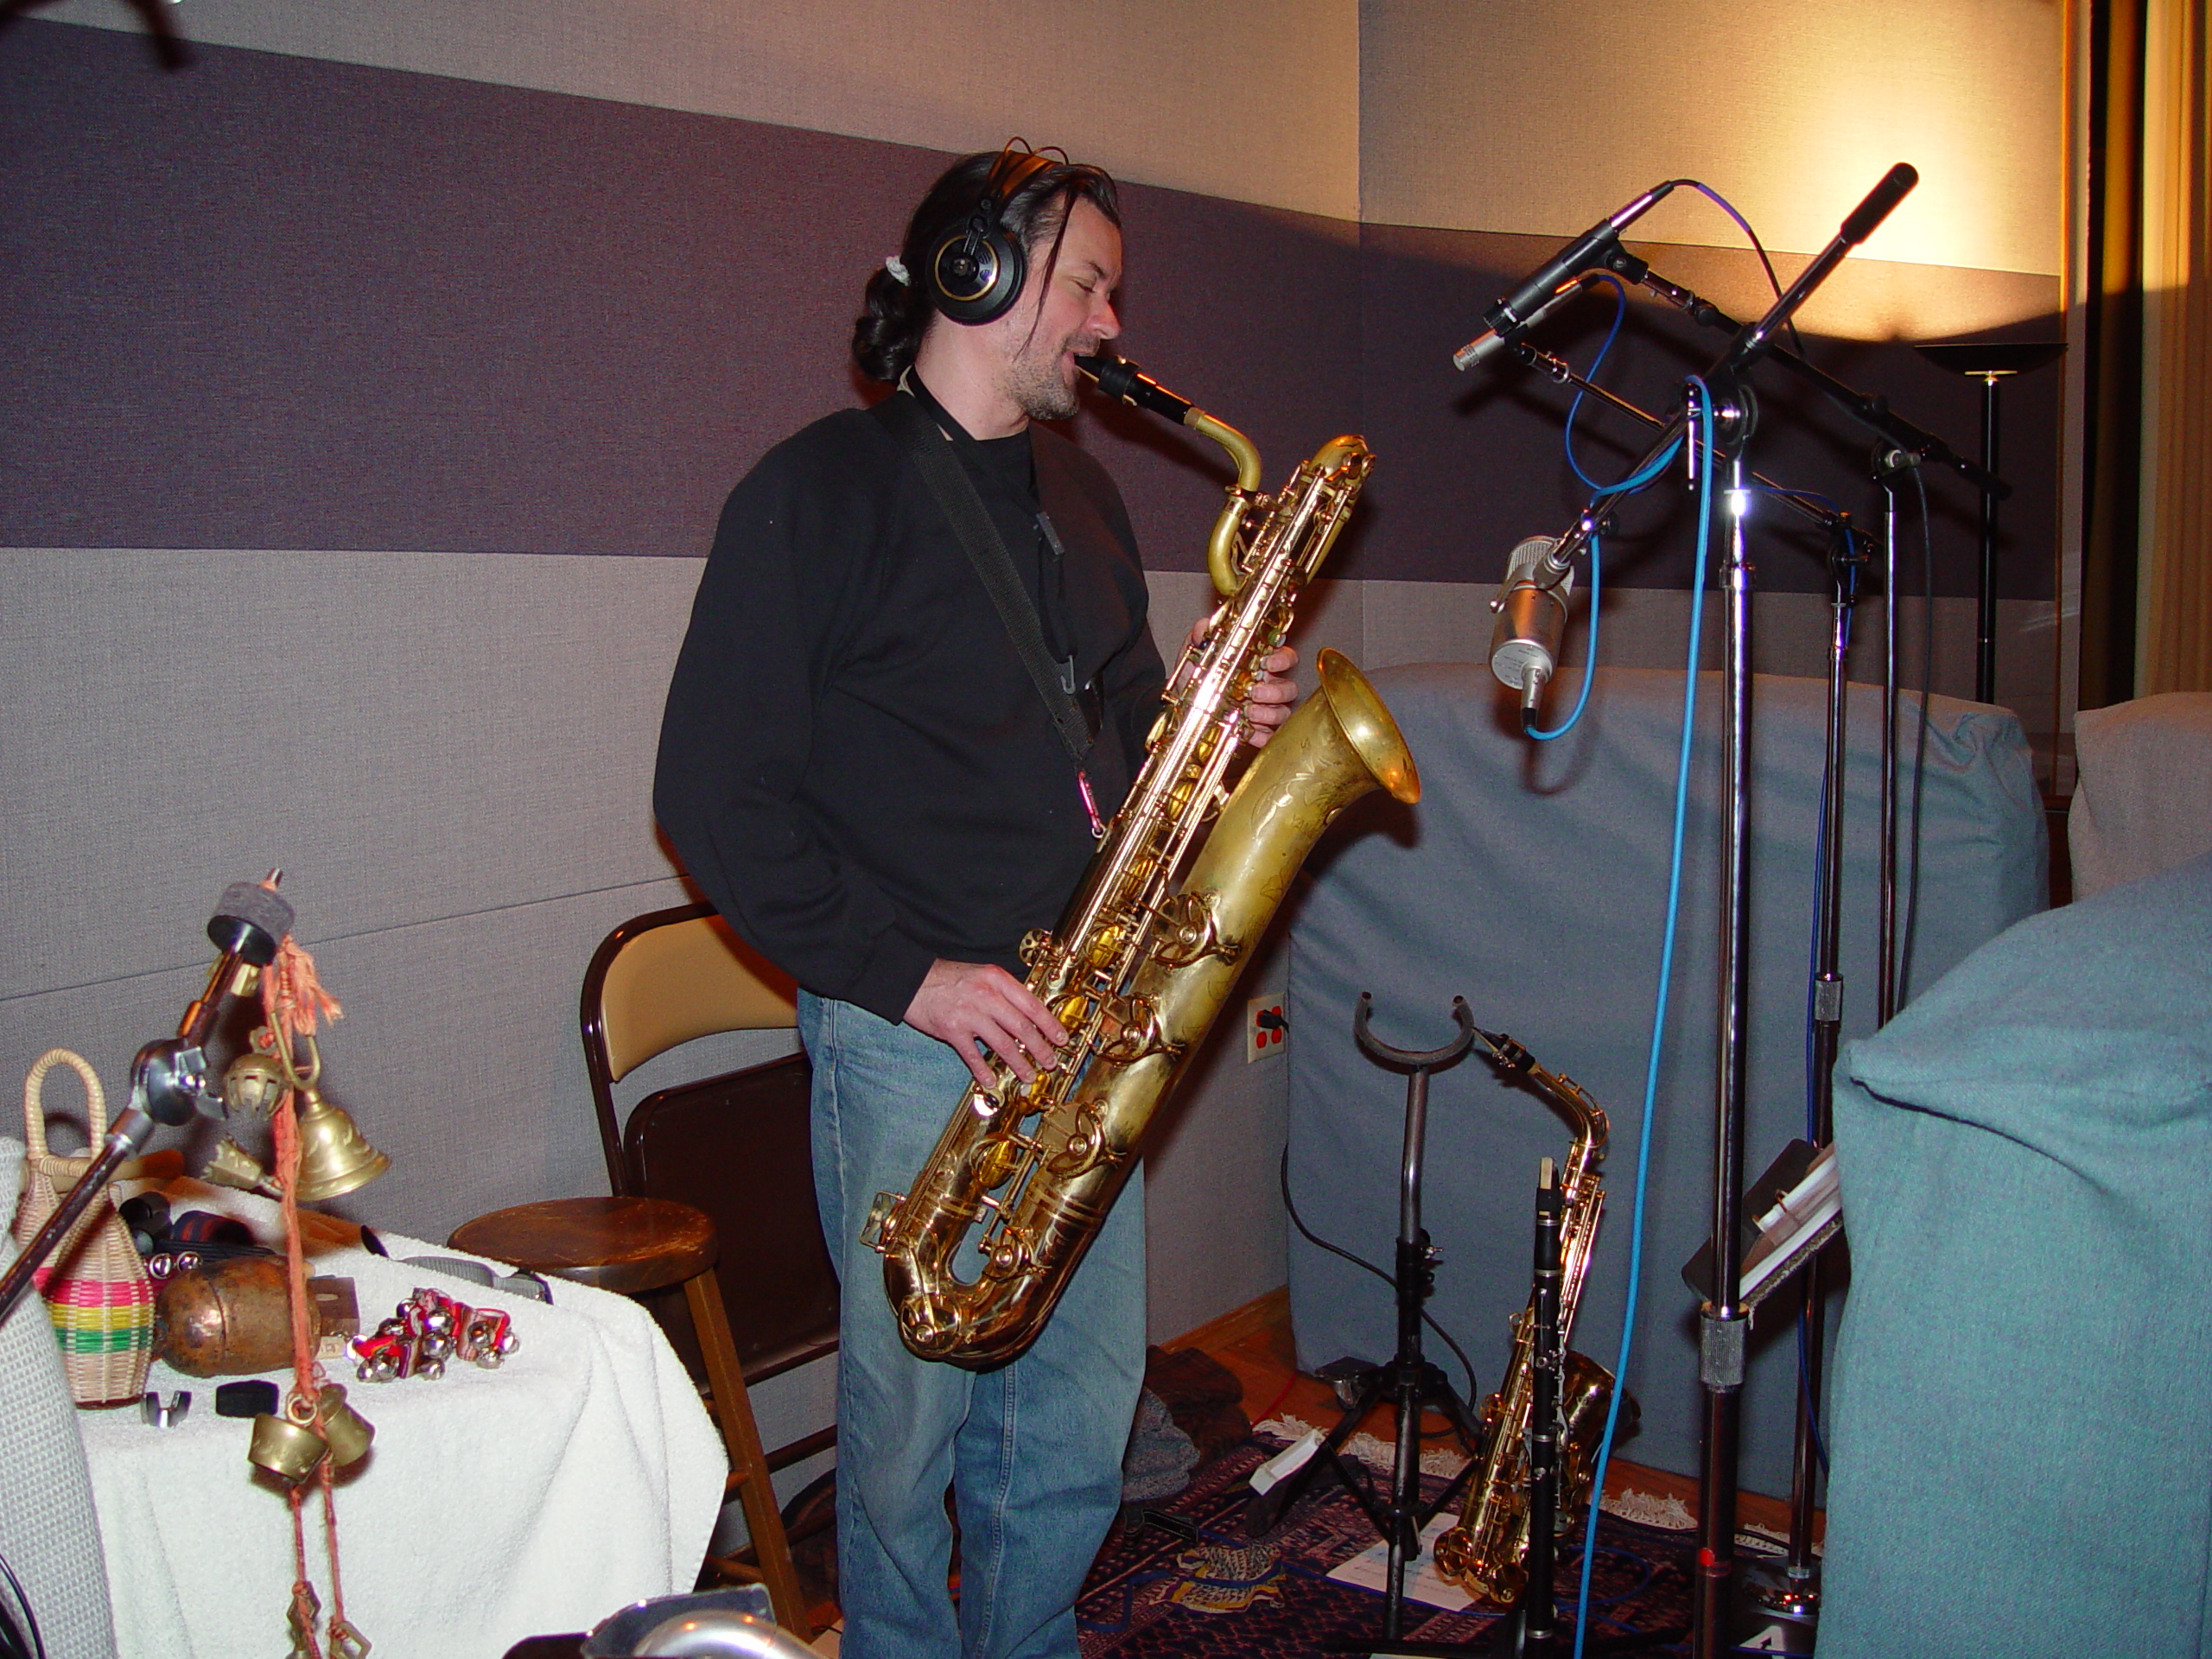 James DeJoie at Triad Studios